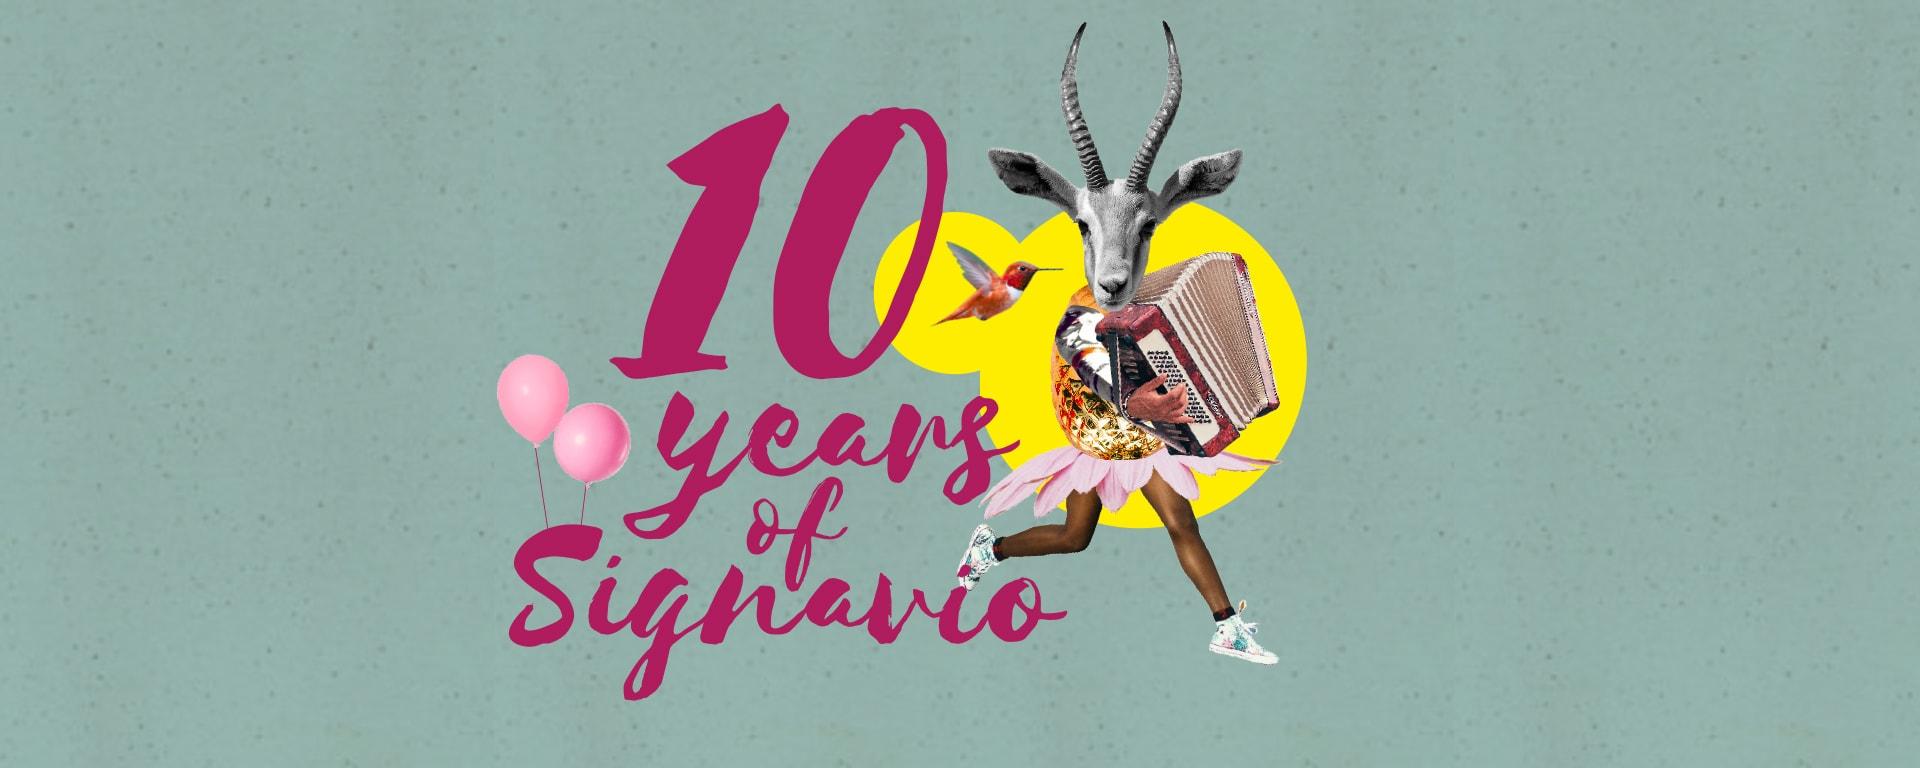 10-years-of-Signavio-fr